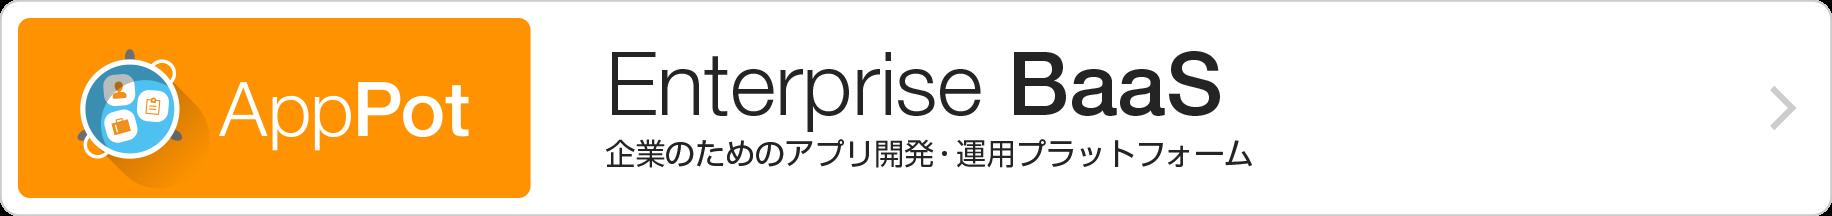 AppPot_banner02